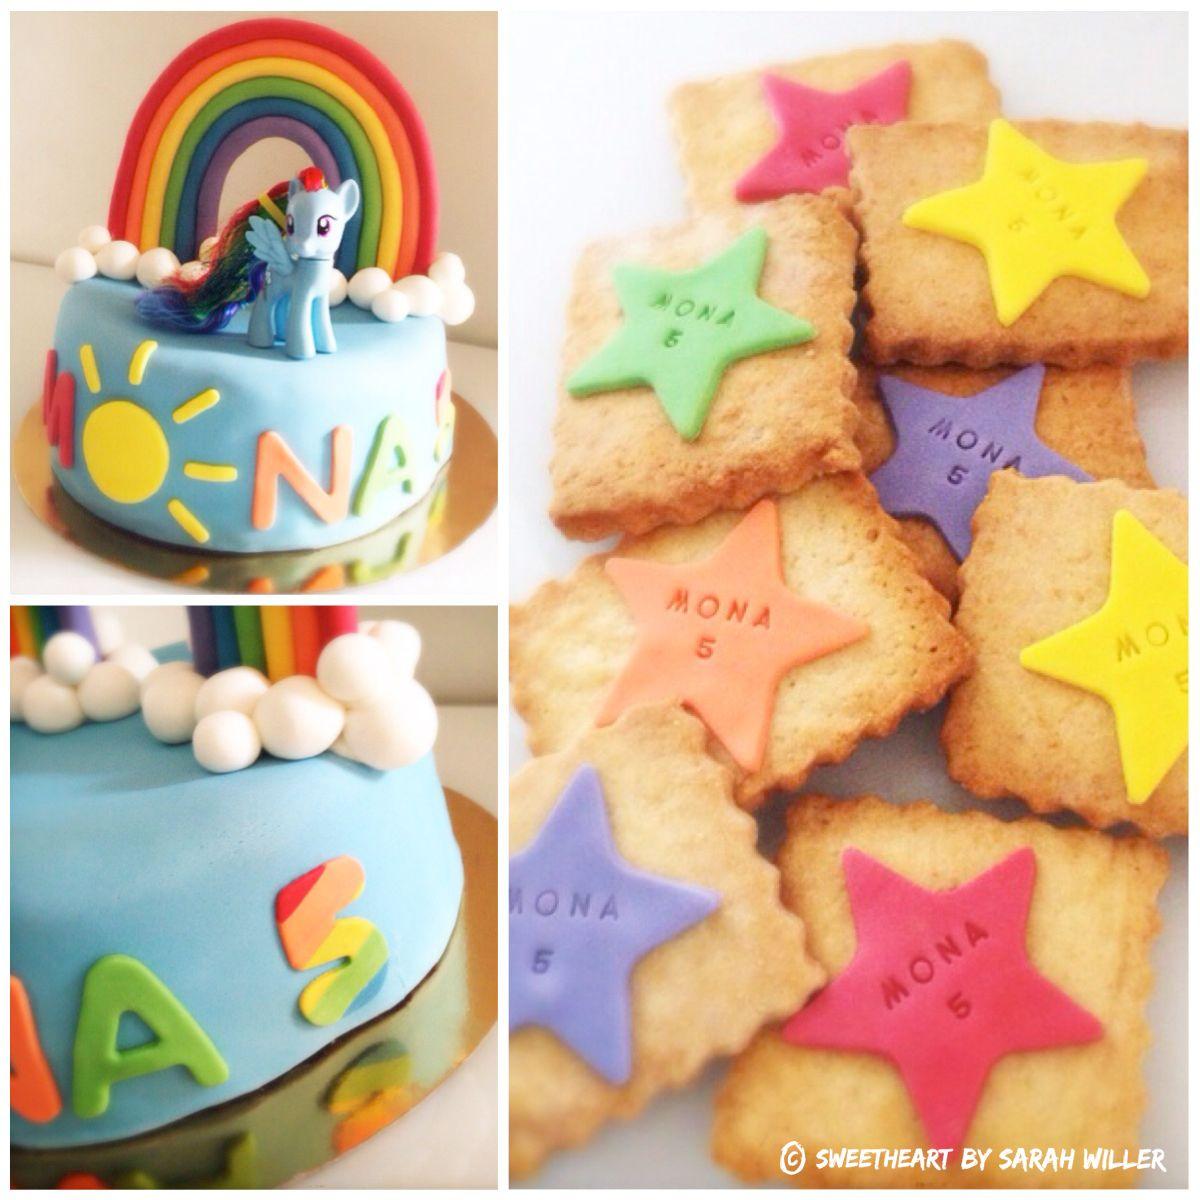 http://sweetheartbysarah.com/wp-content/uploads/2013/05/Rainbowdecoratedcookies.jpg